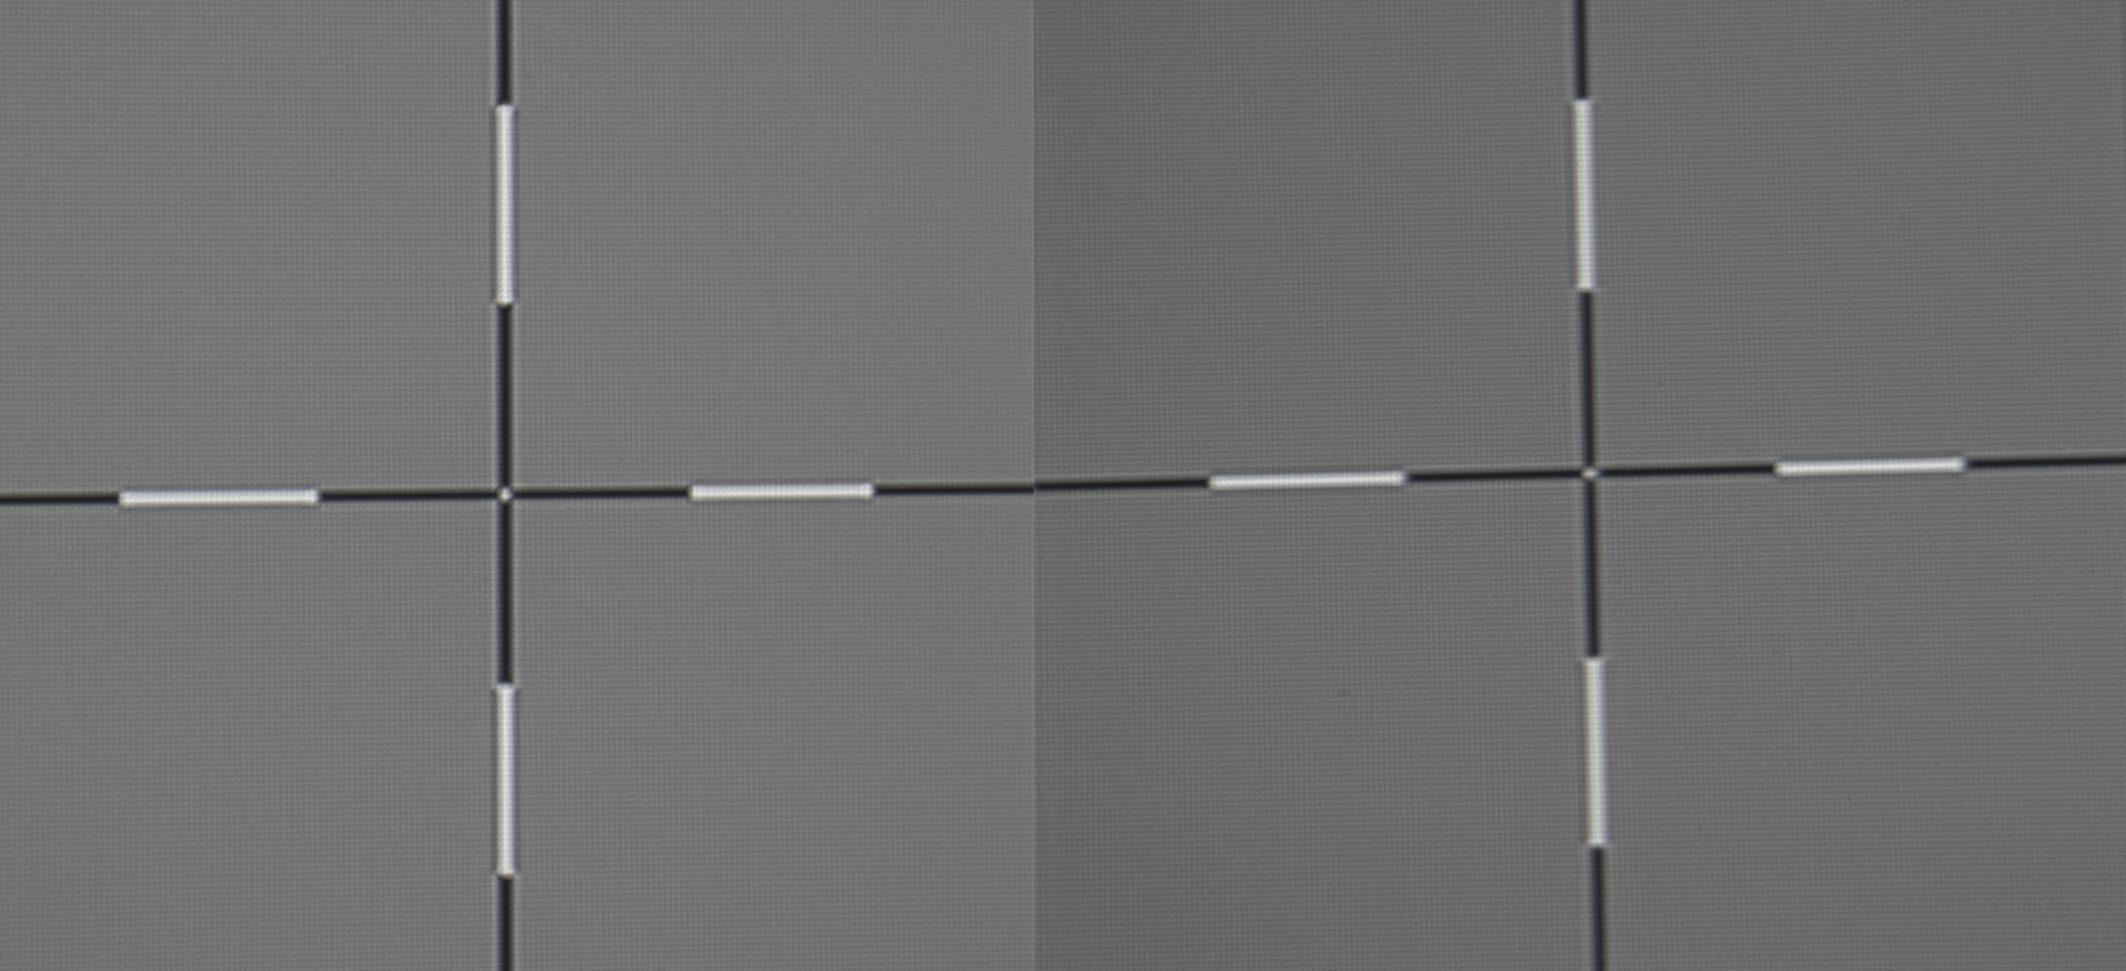 Acer V9800 - Schärfe - links Leinwandmitte - rechts Leinwand linke Seite